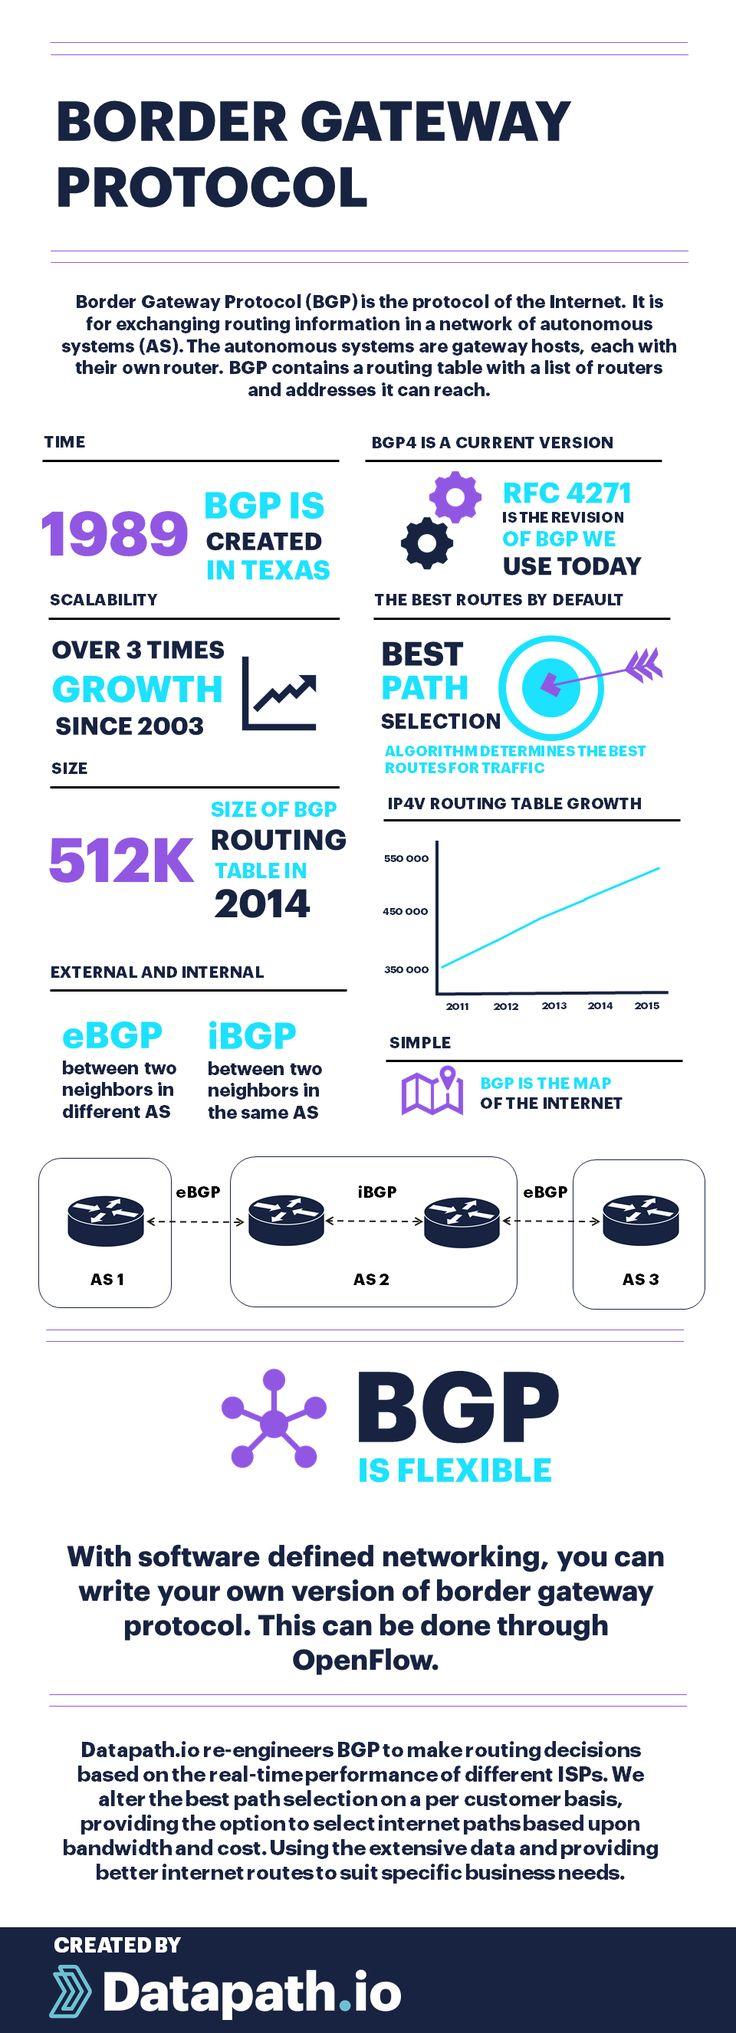 Border Gateway Protocol Infographic (BGP)